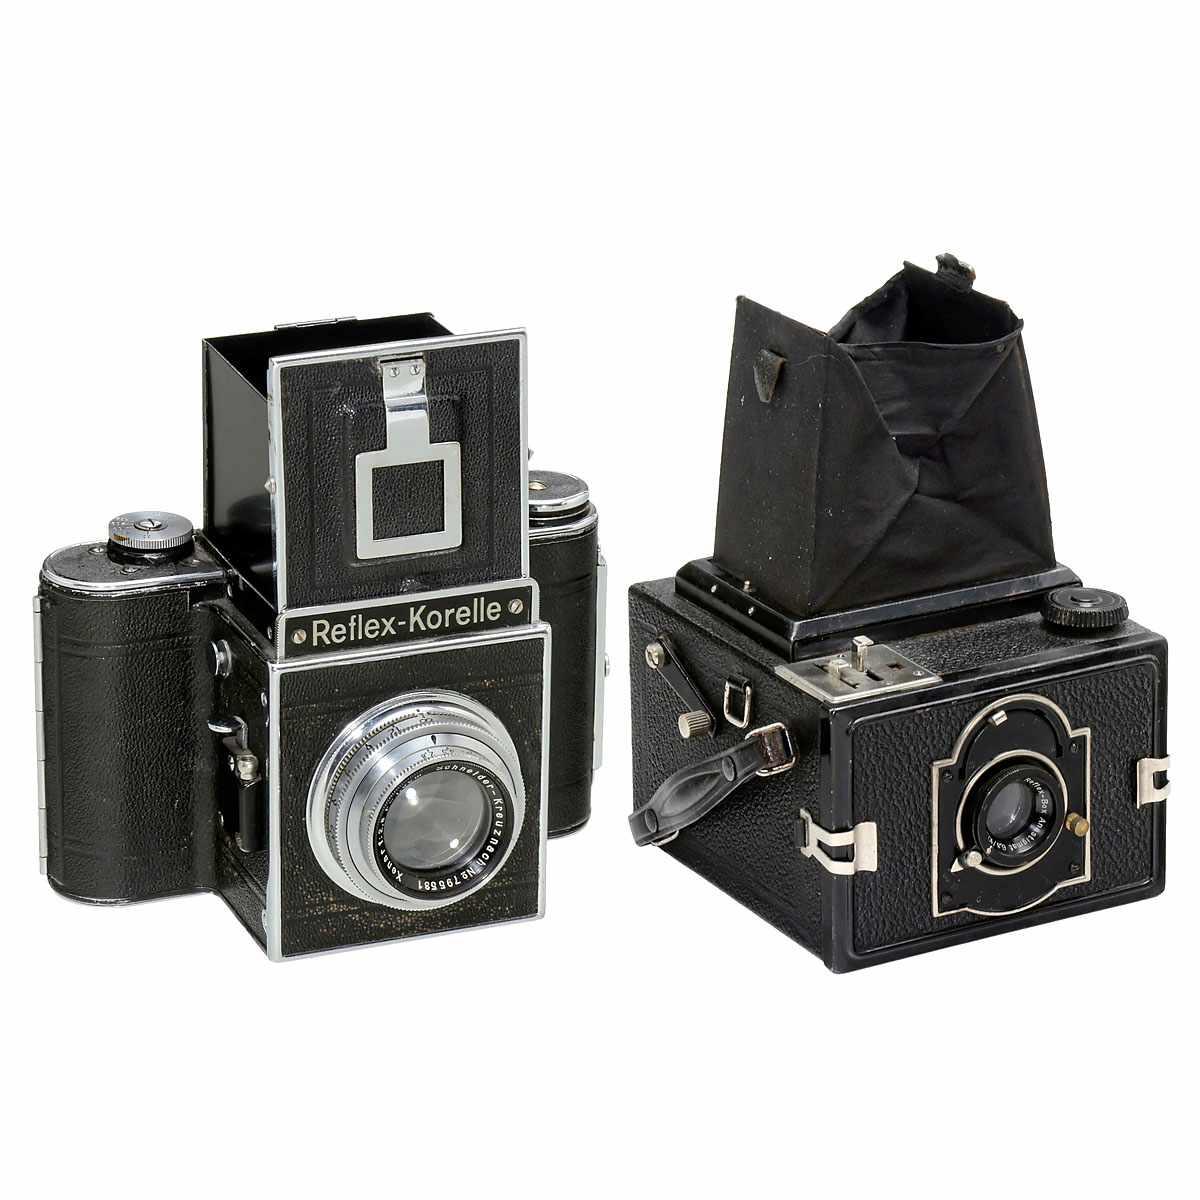 K.W. Reflex-Box and Reflex-Korelle 1) Kamera-Werkstätten, Dresden. Reflex-Box, SLR camera, for 8